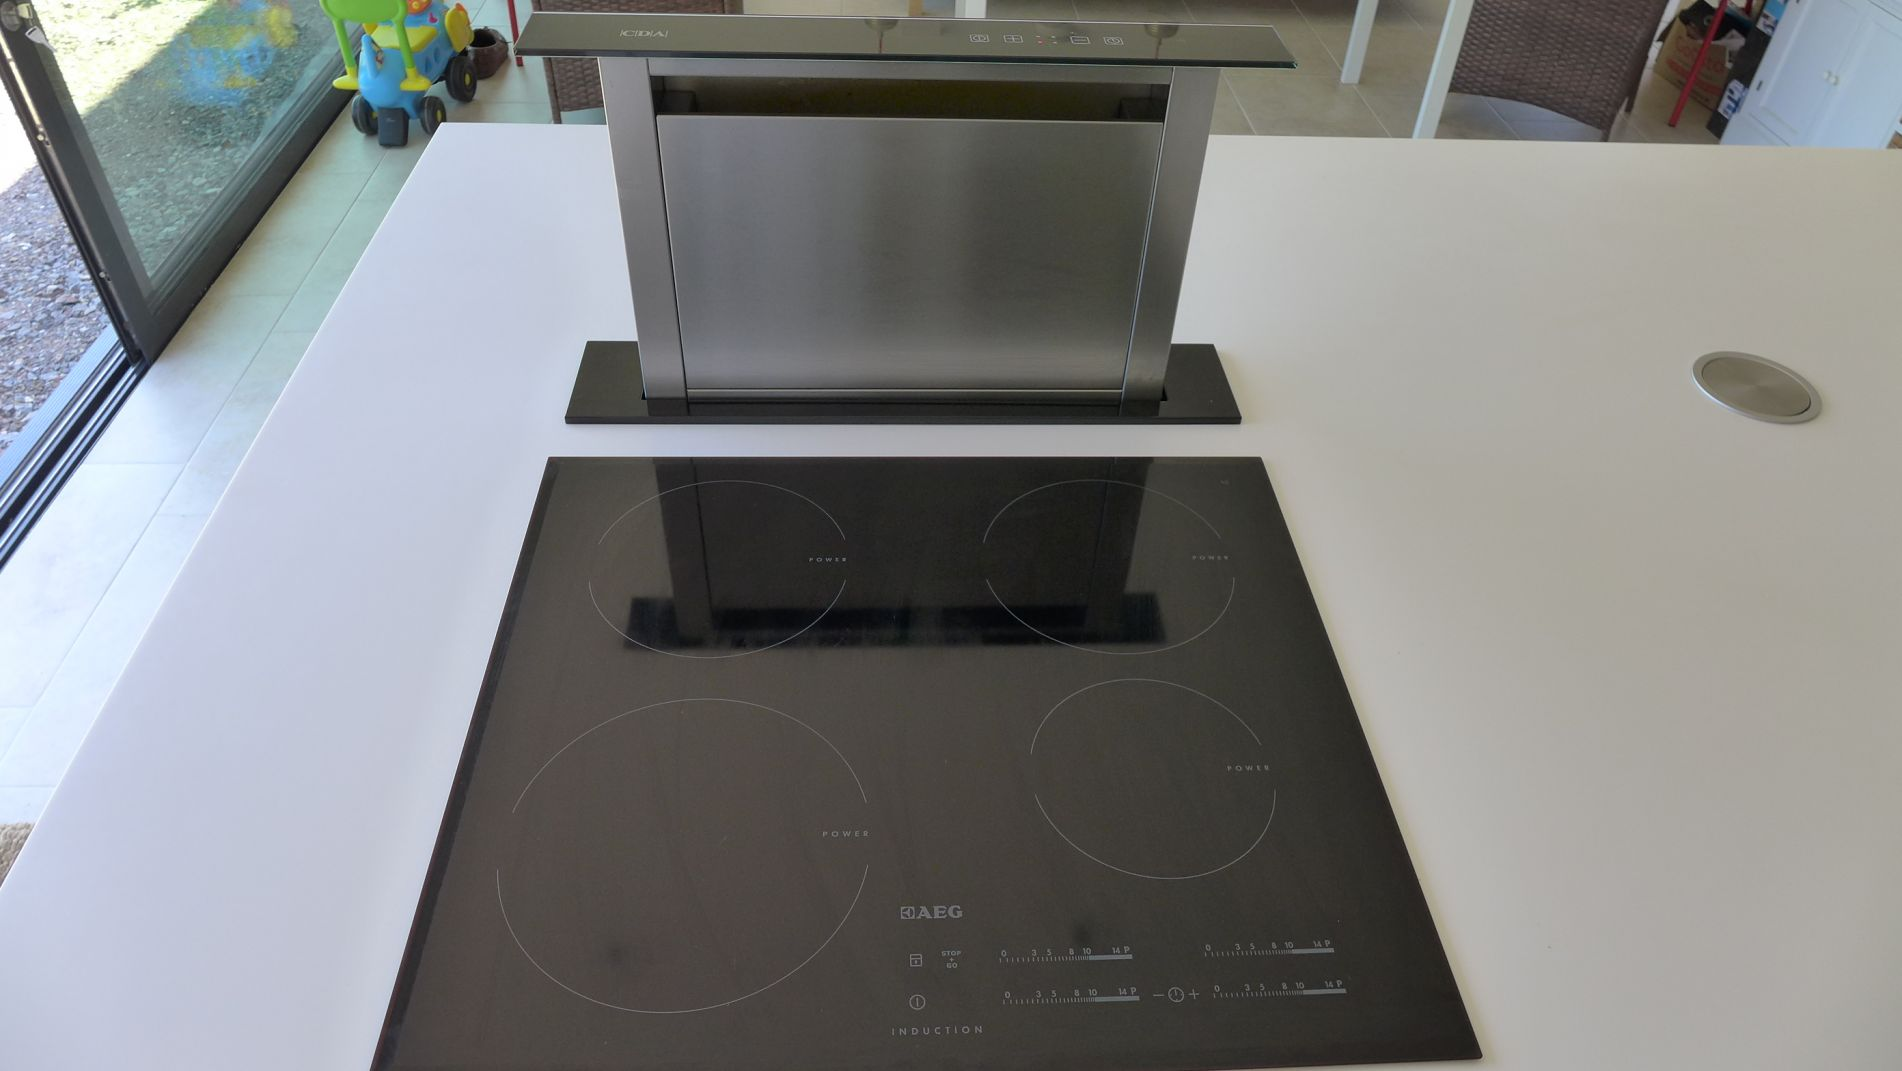 pop up downdraft kitchen extractor